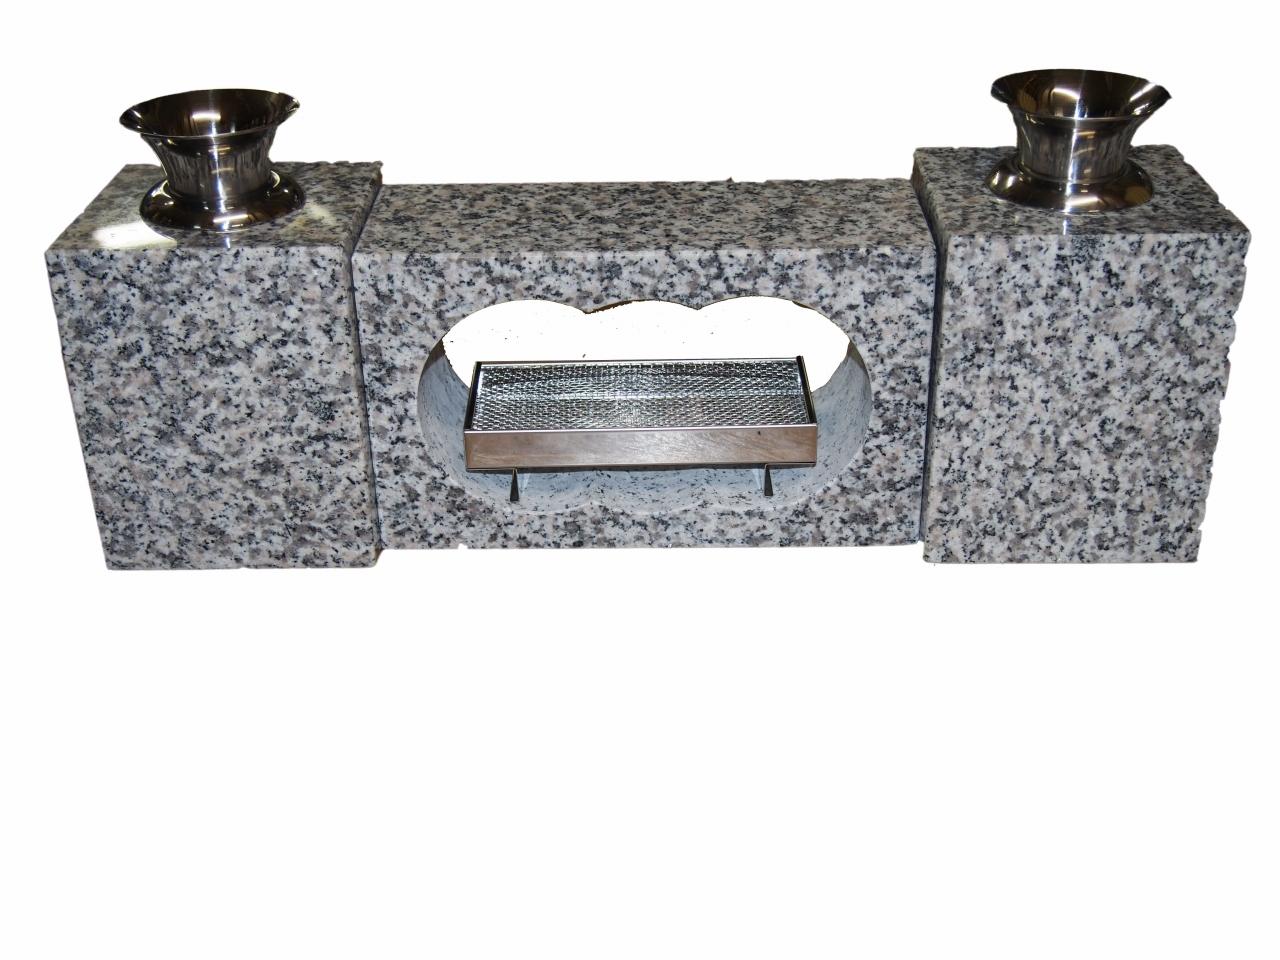 【送料無料】白御影石 墓用 香炉セット S 19kg